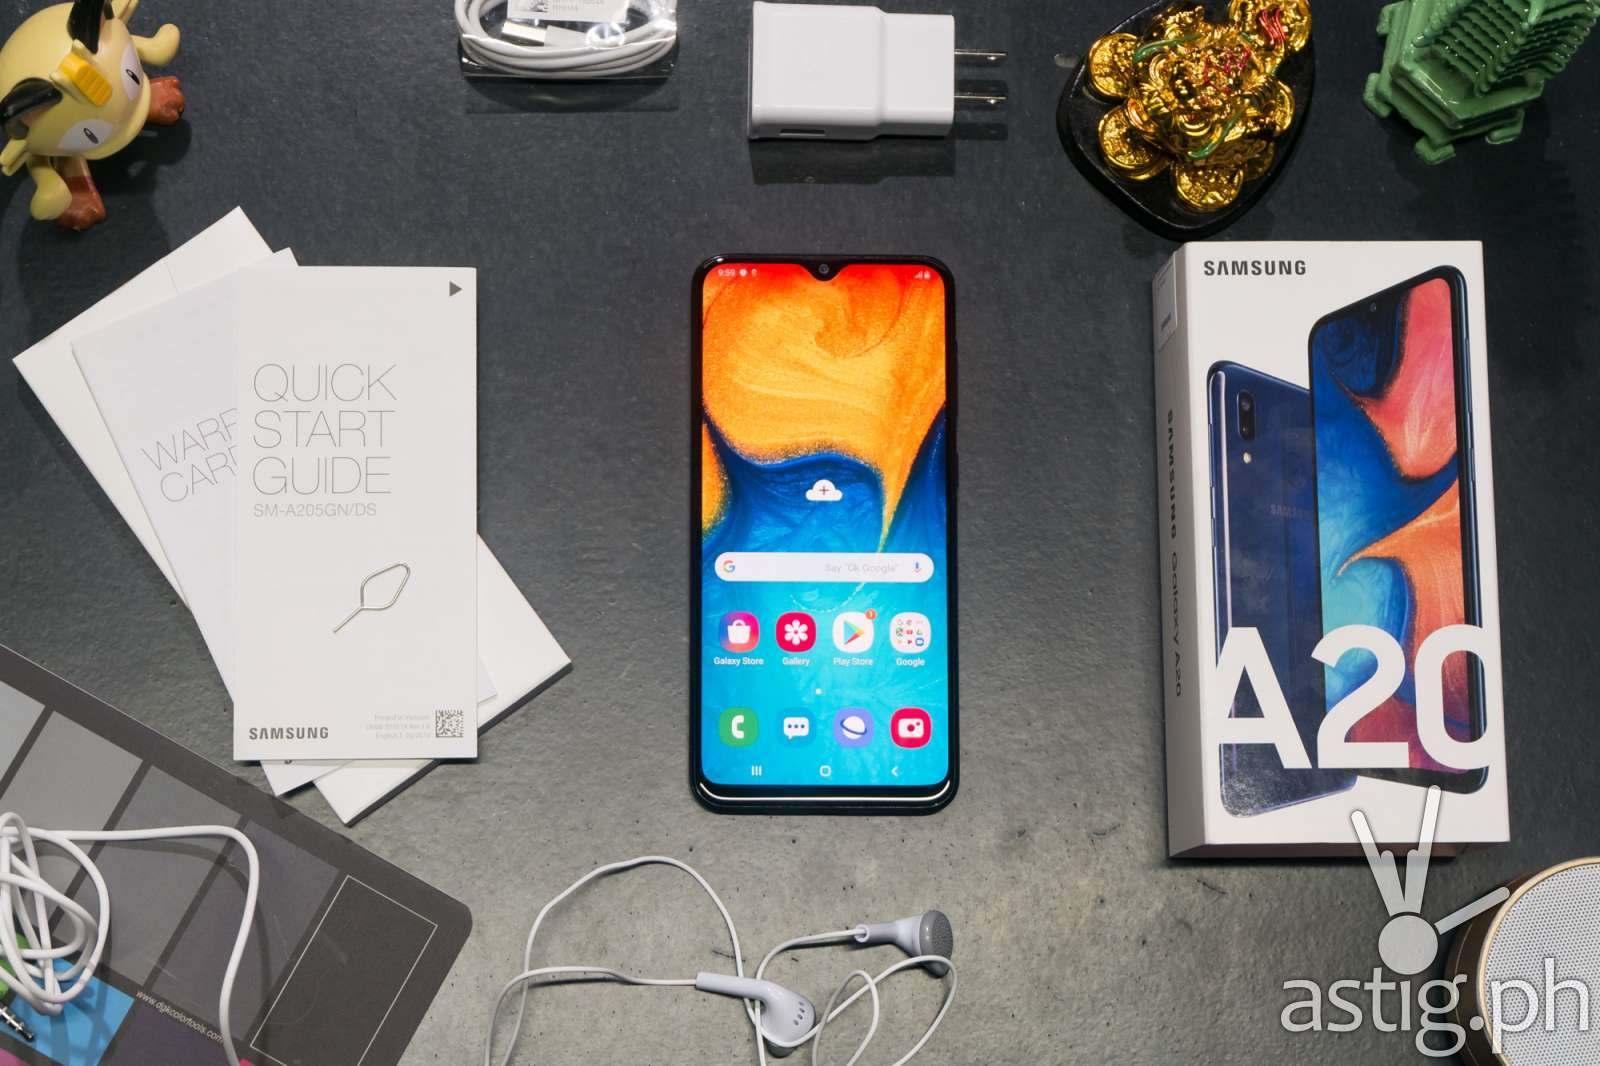 Samsung Galaxy A20 (Philippines) (3)